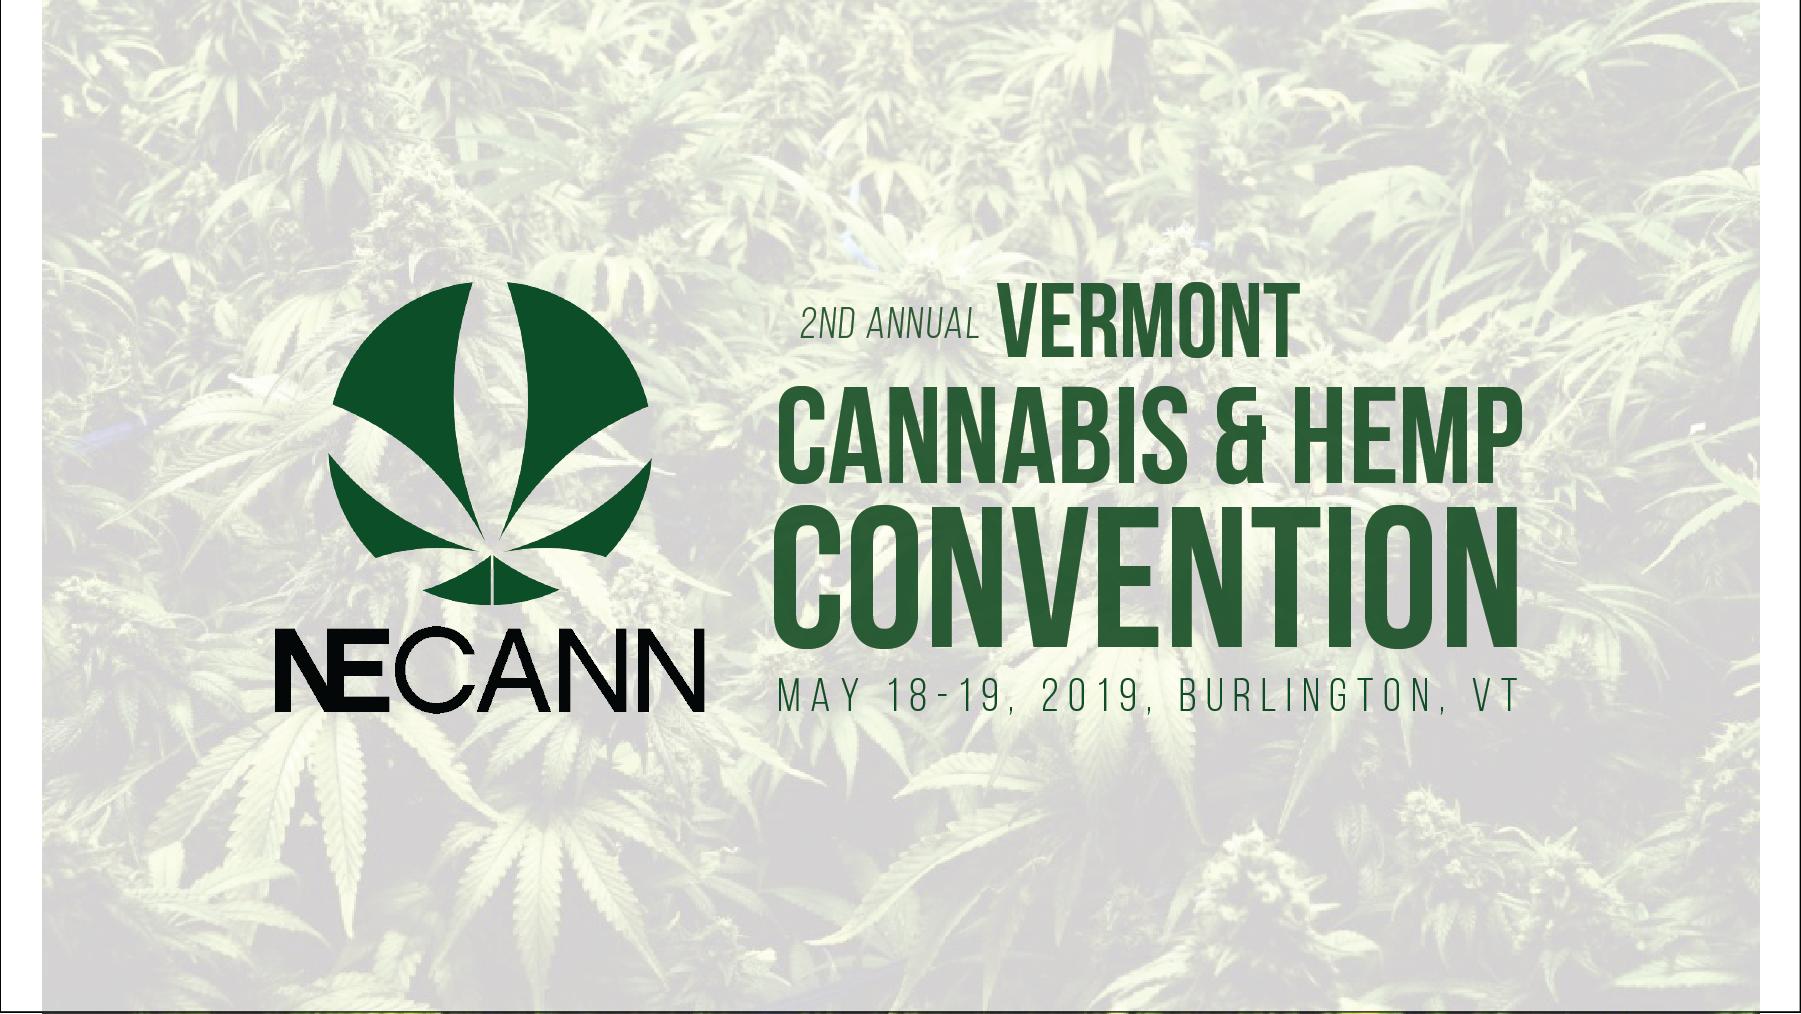 Vermont Cannabis and Hemp Convention 2019 | Vermont Cannabis